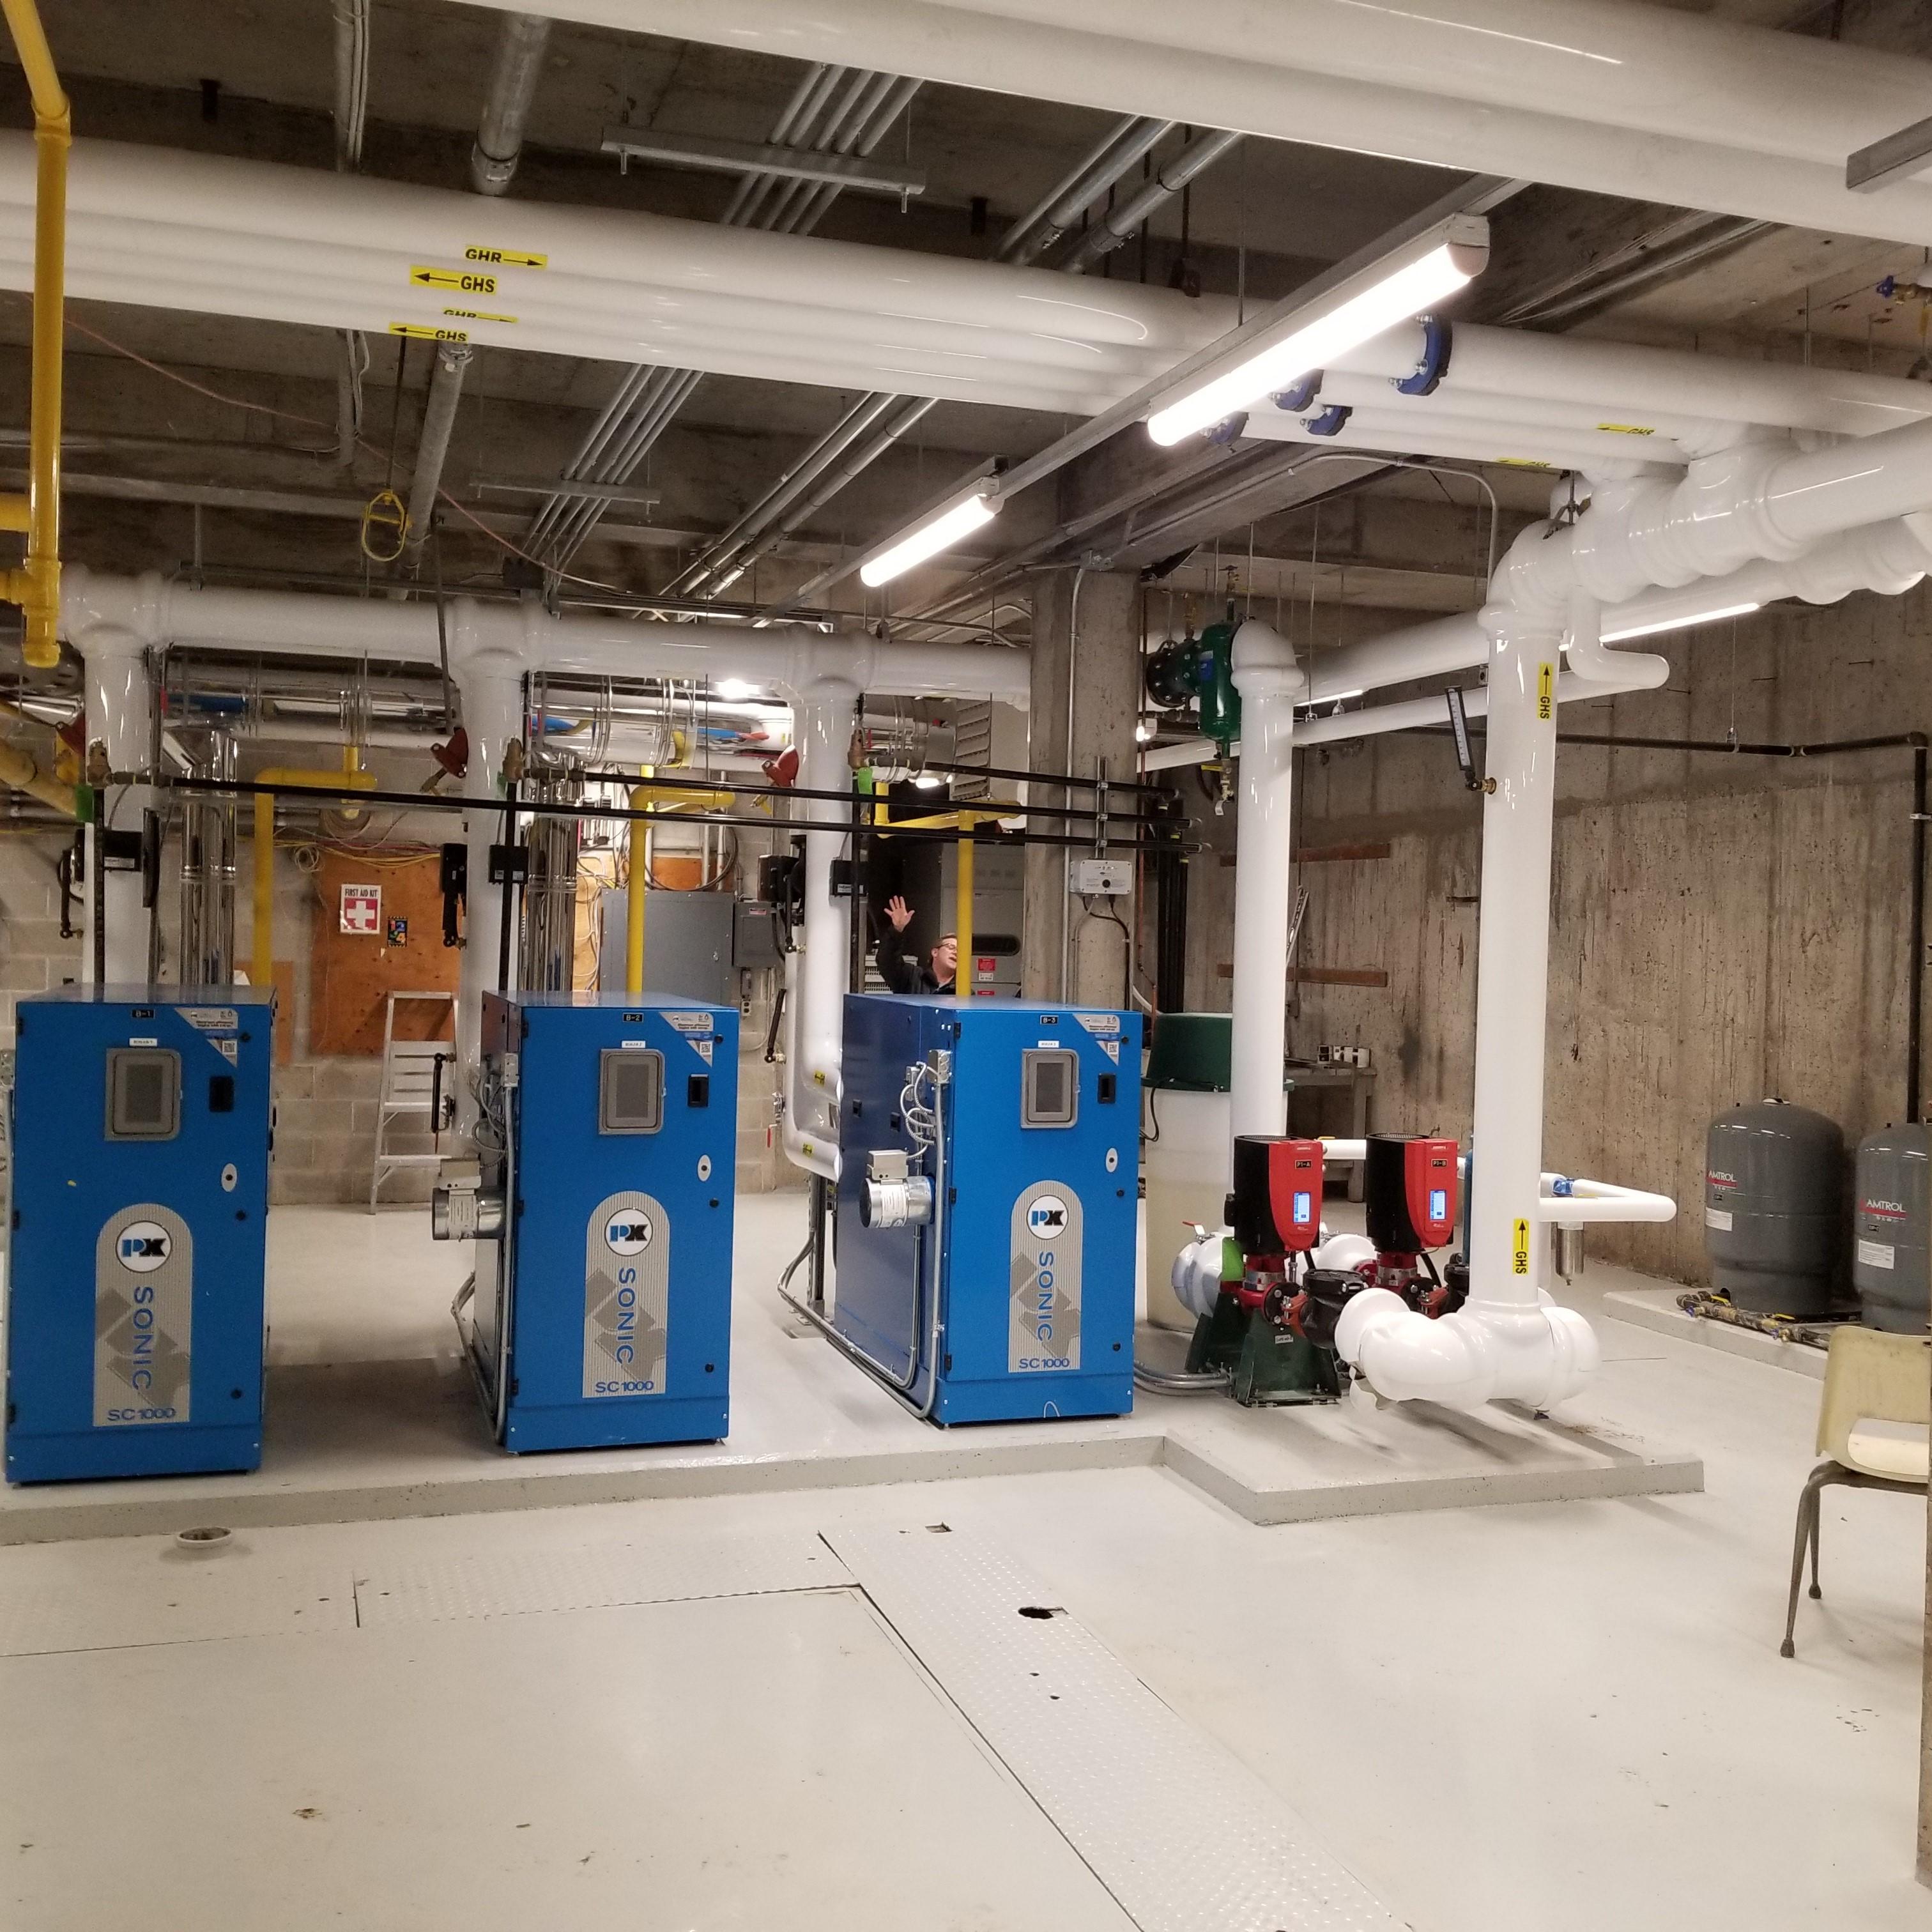 very impressive large mechanical room